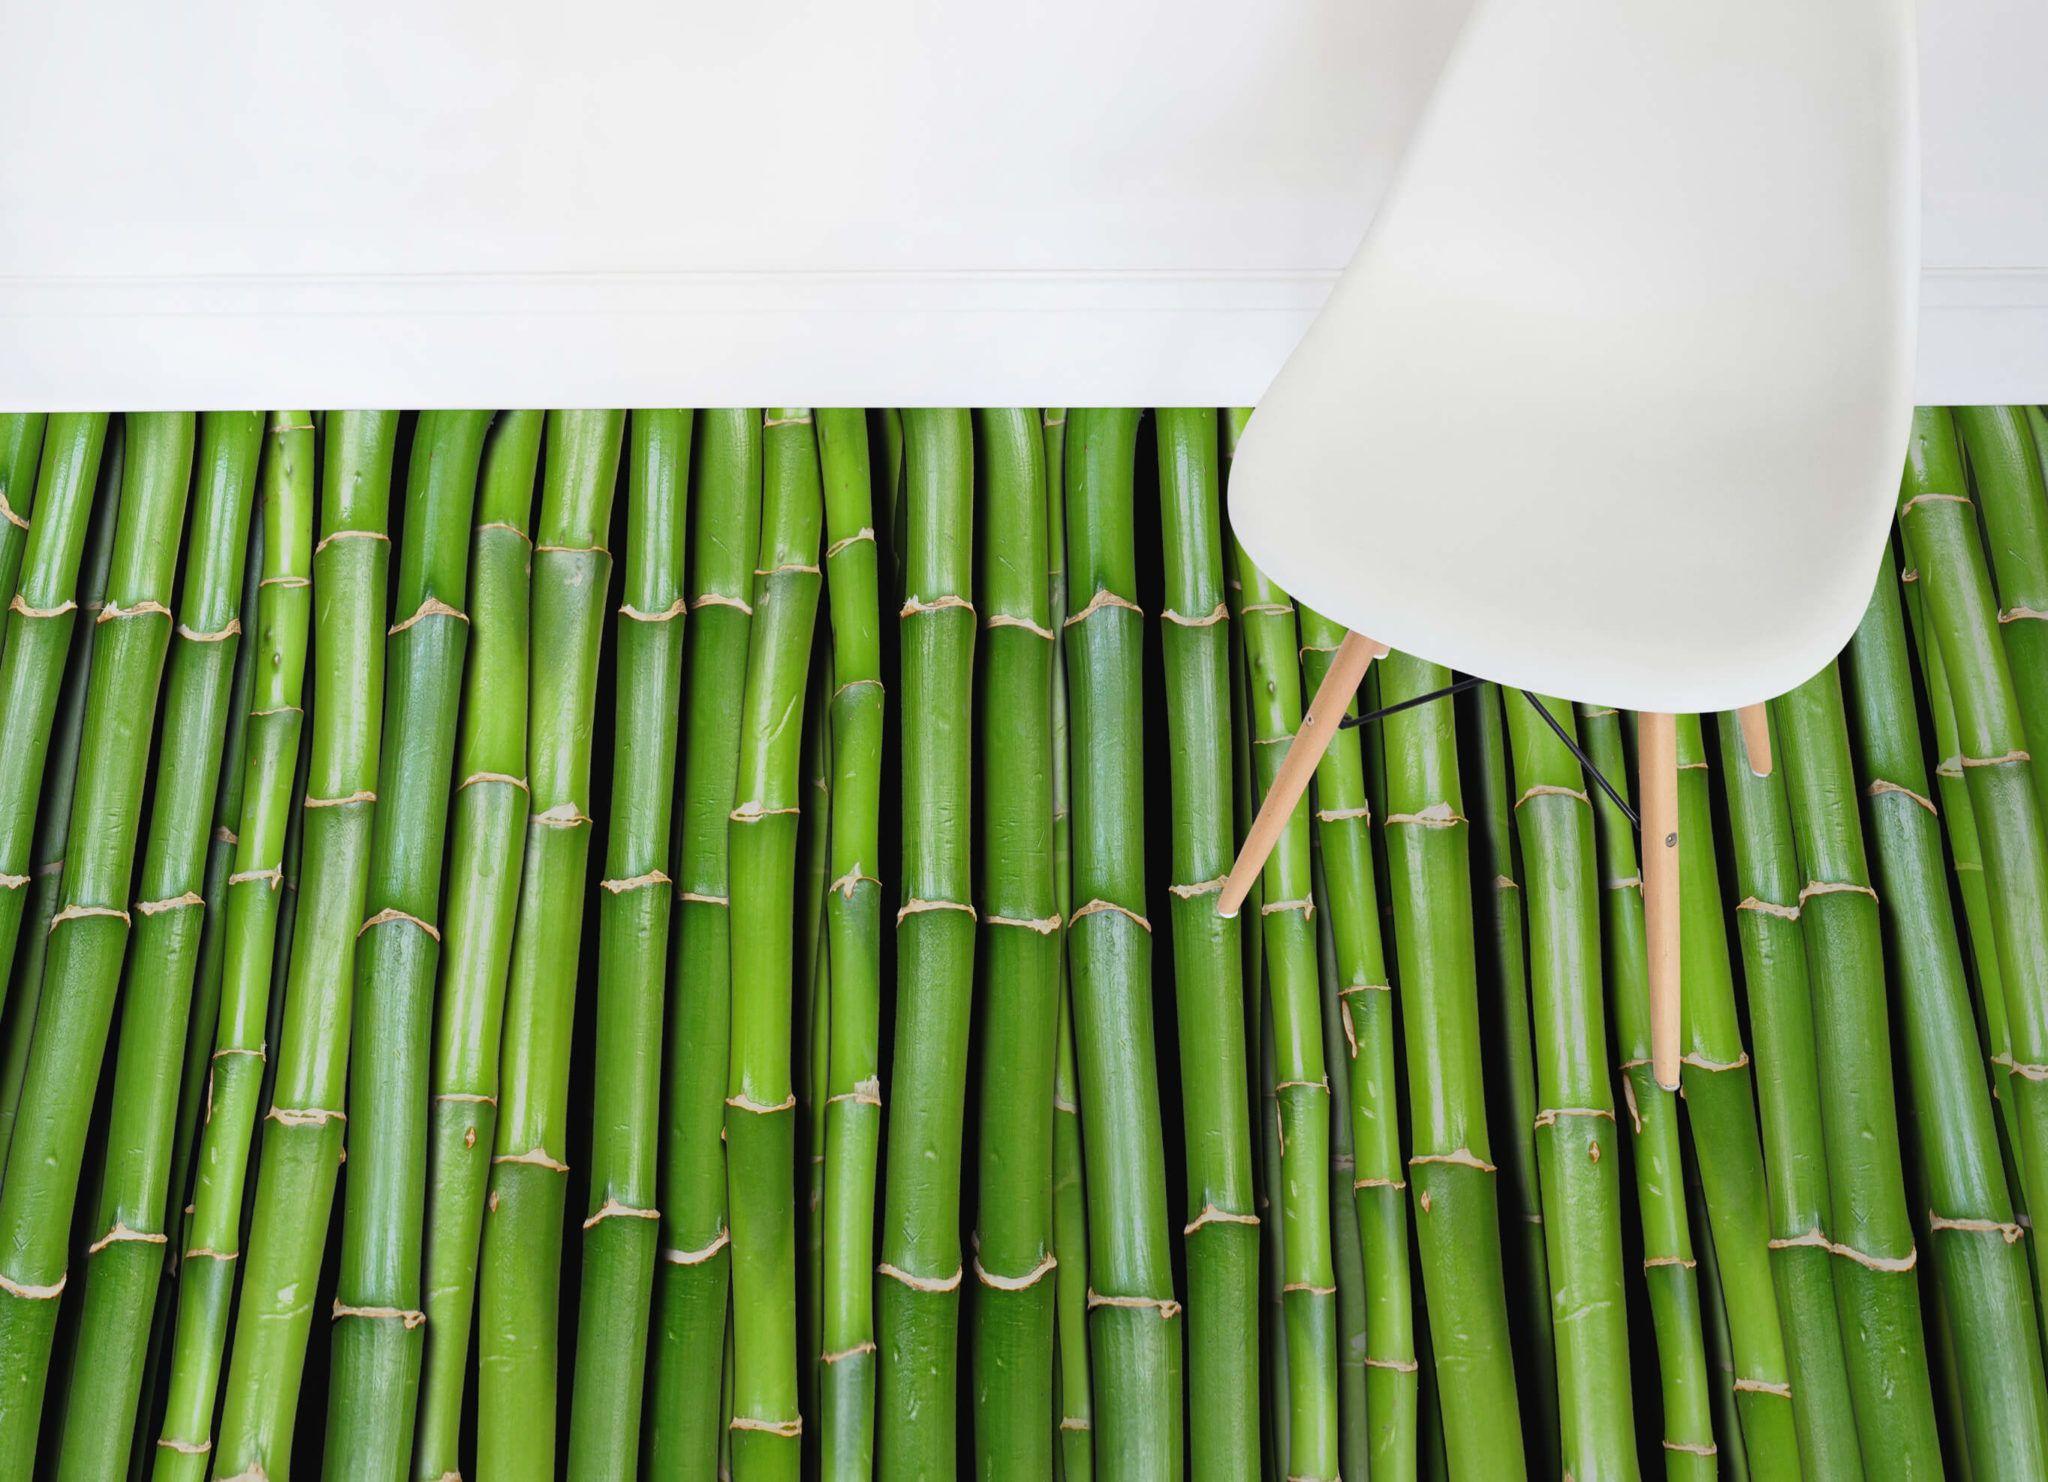 Bamboo Effect Vinyl Flooring | Flooring | Pinterest ...